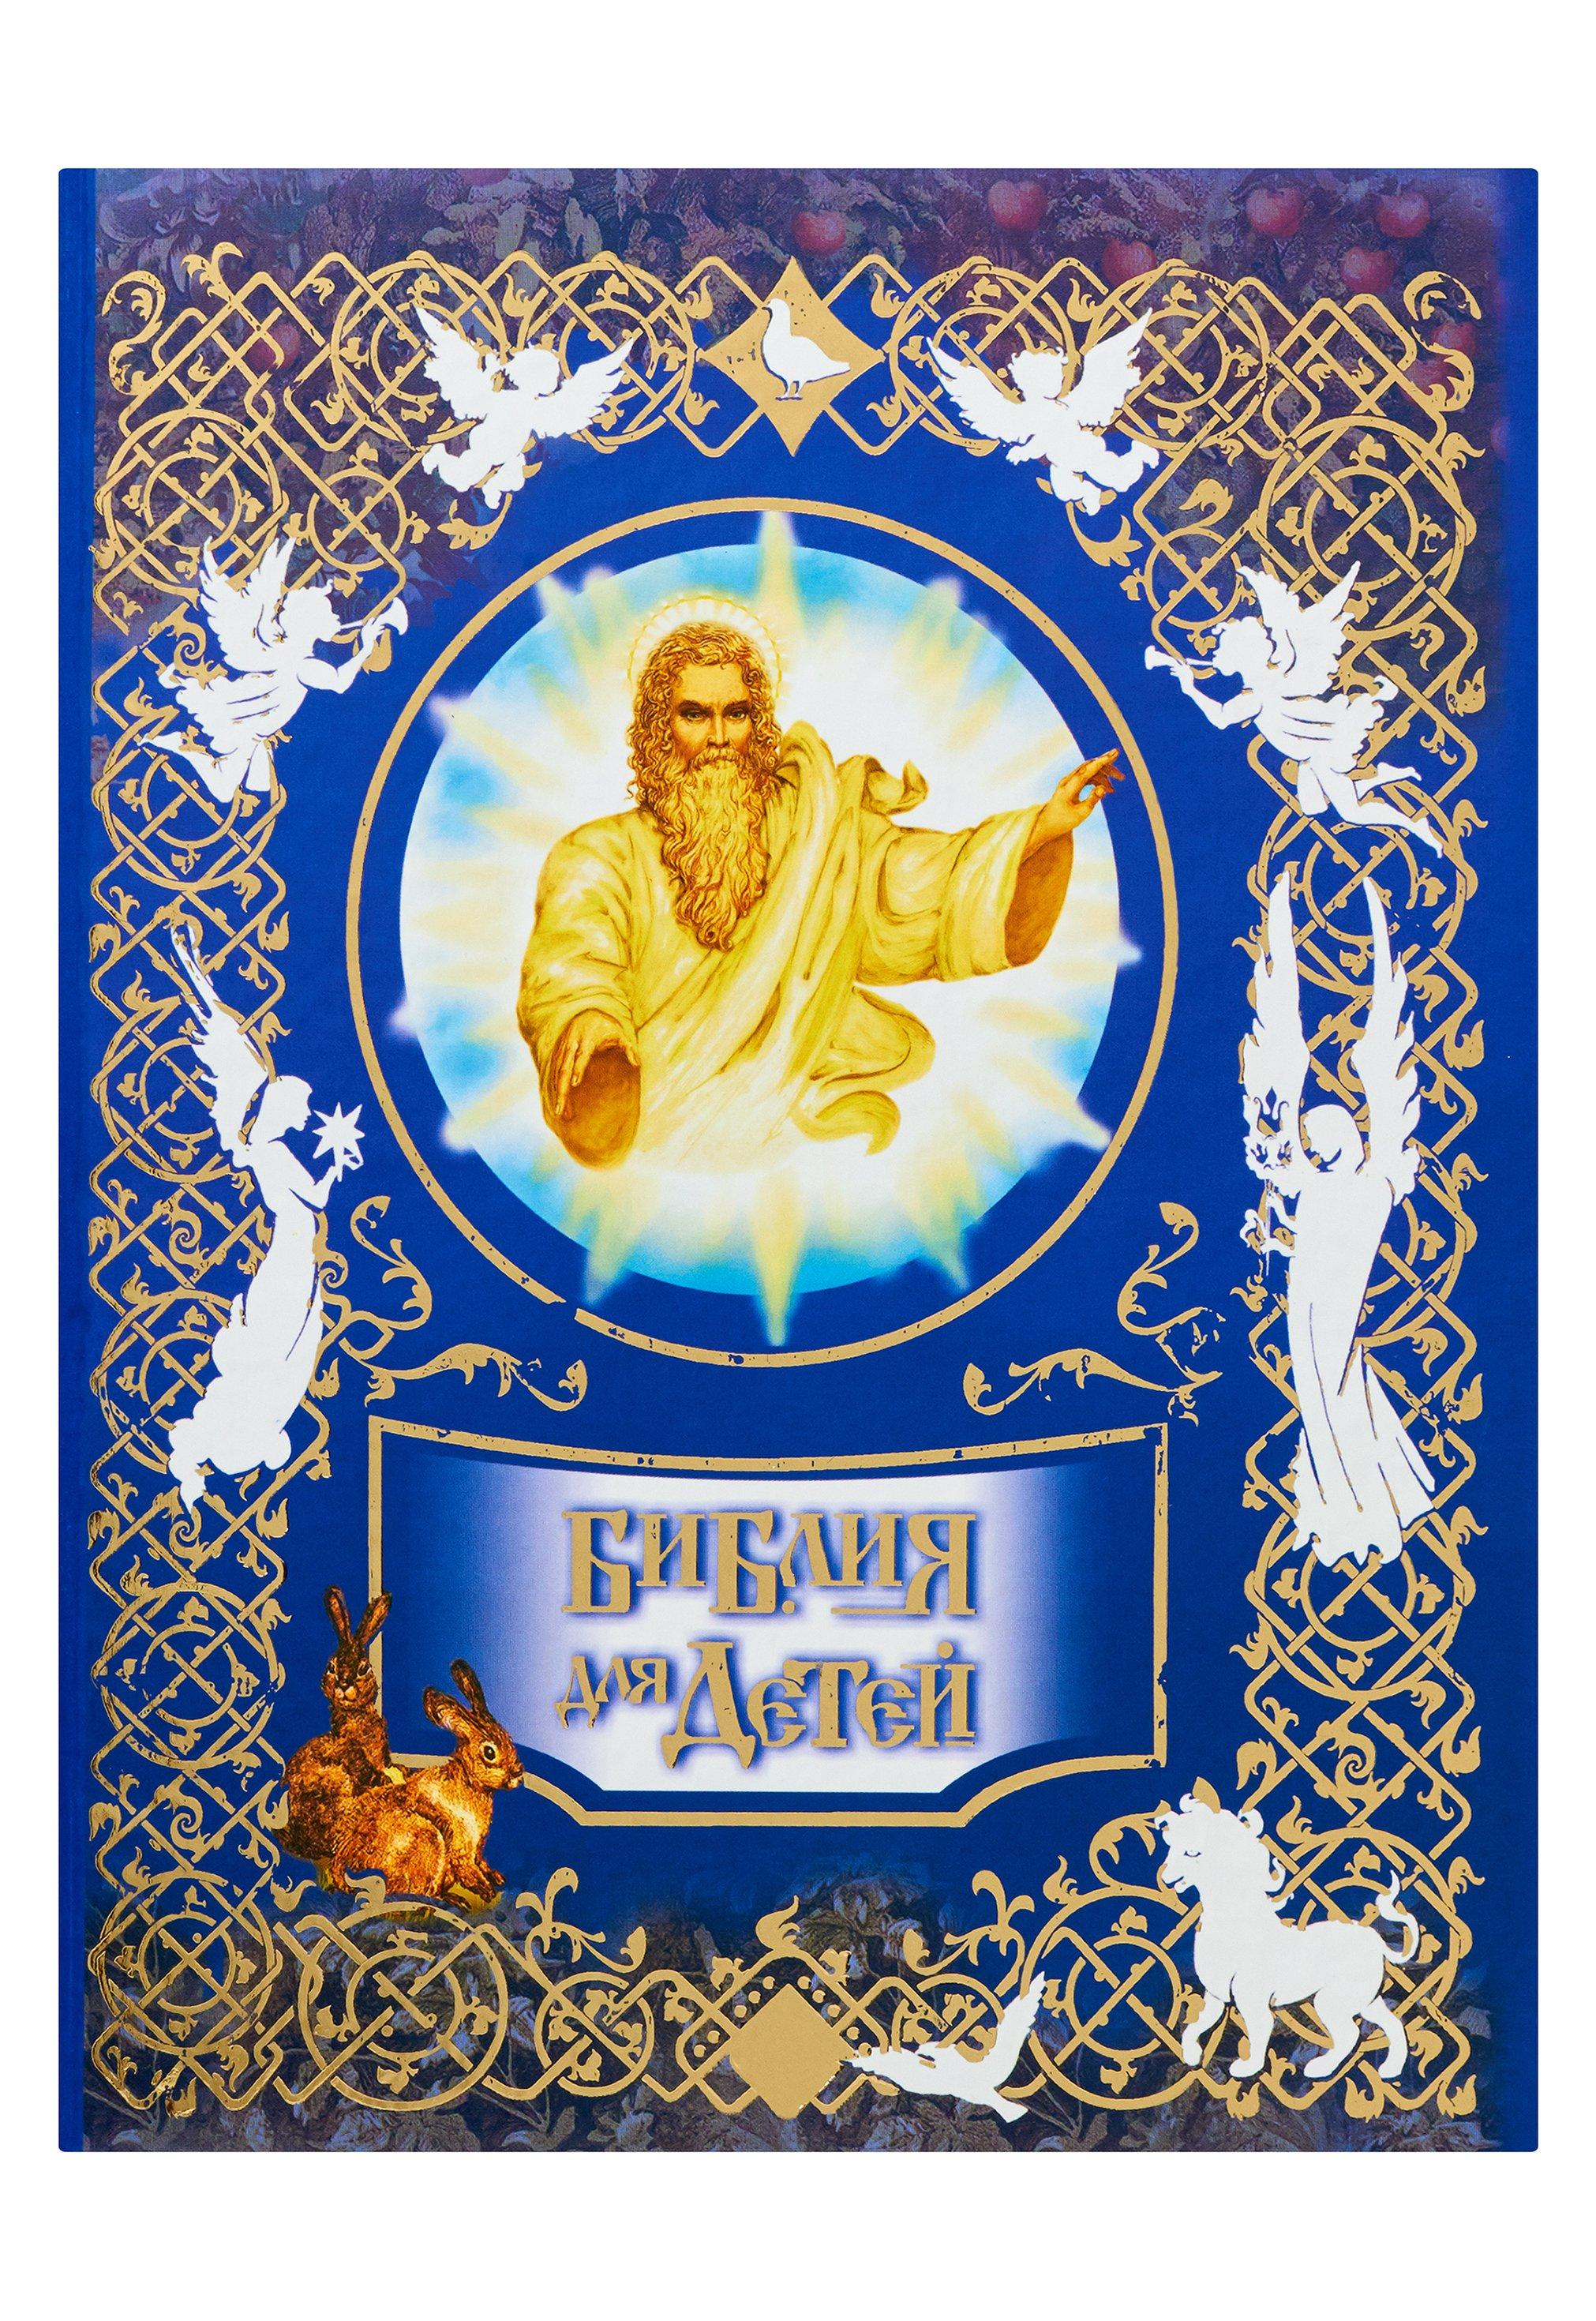 цена на Полянская Ирина Николаевна Библия для детей